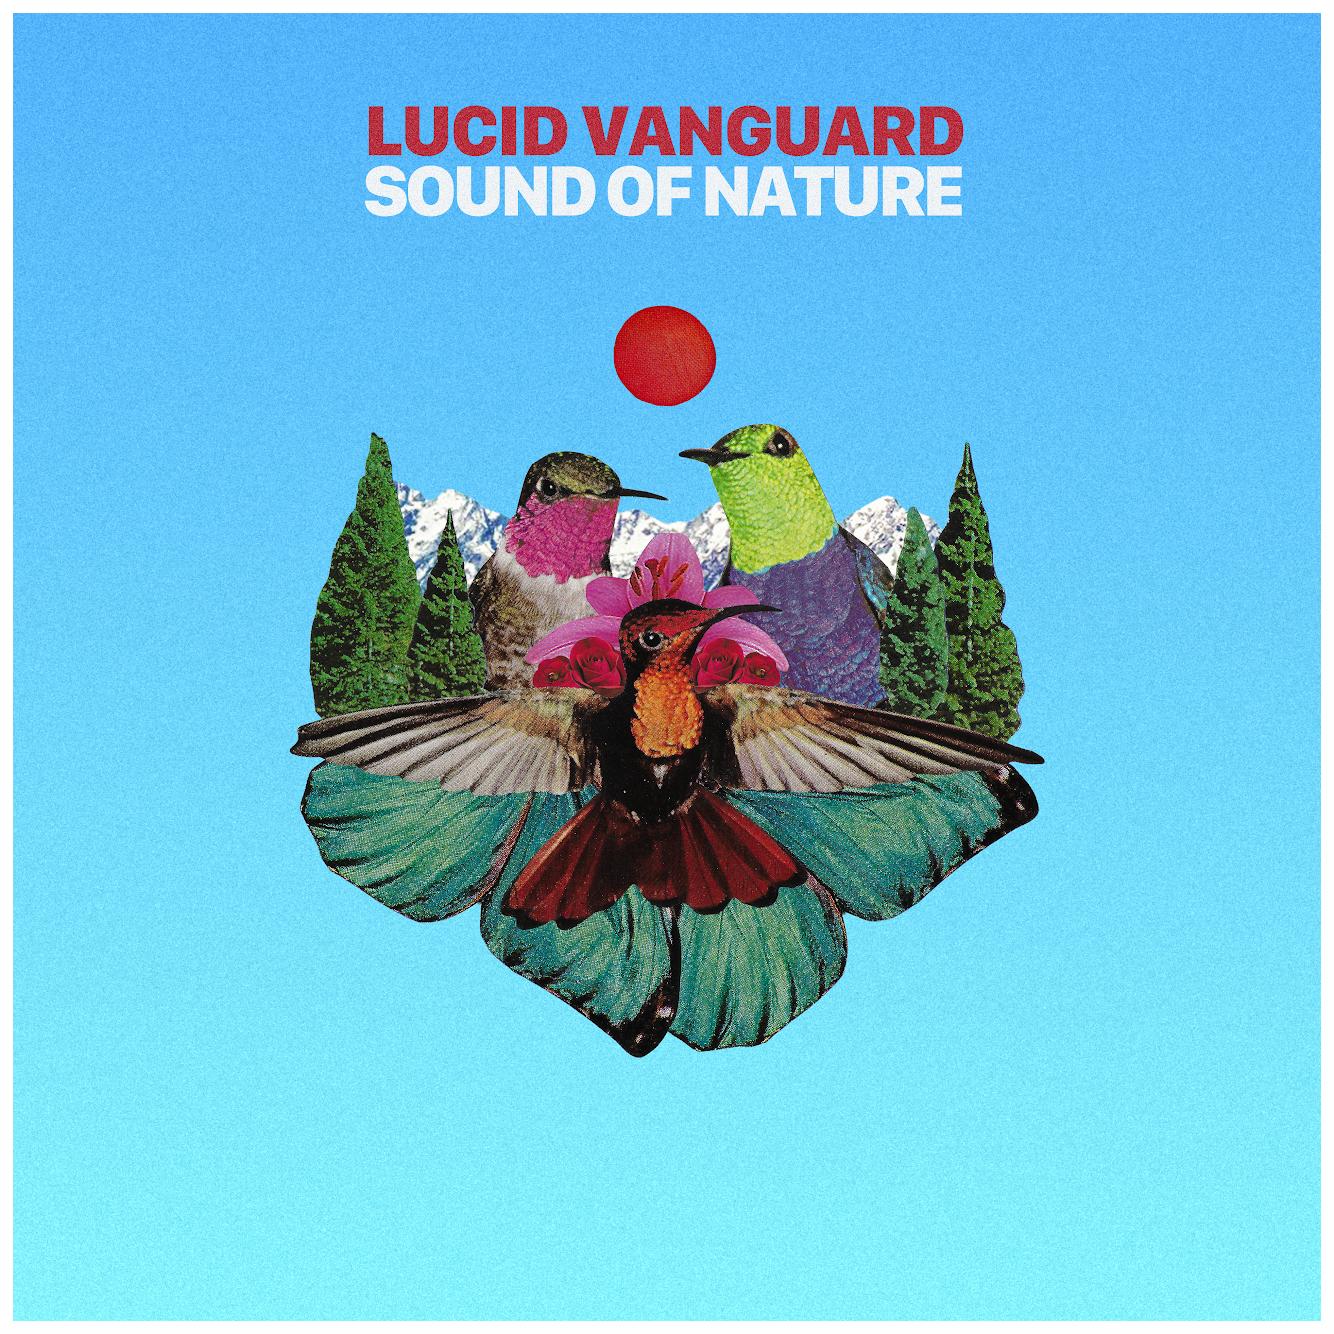 Sound of Nature - Lucid VanGuard